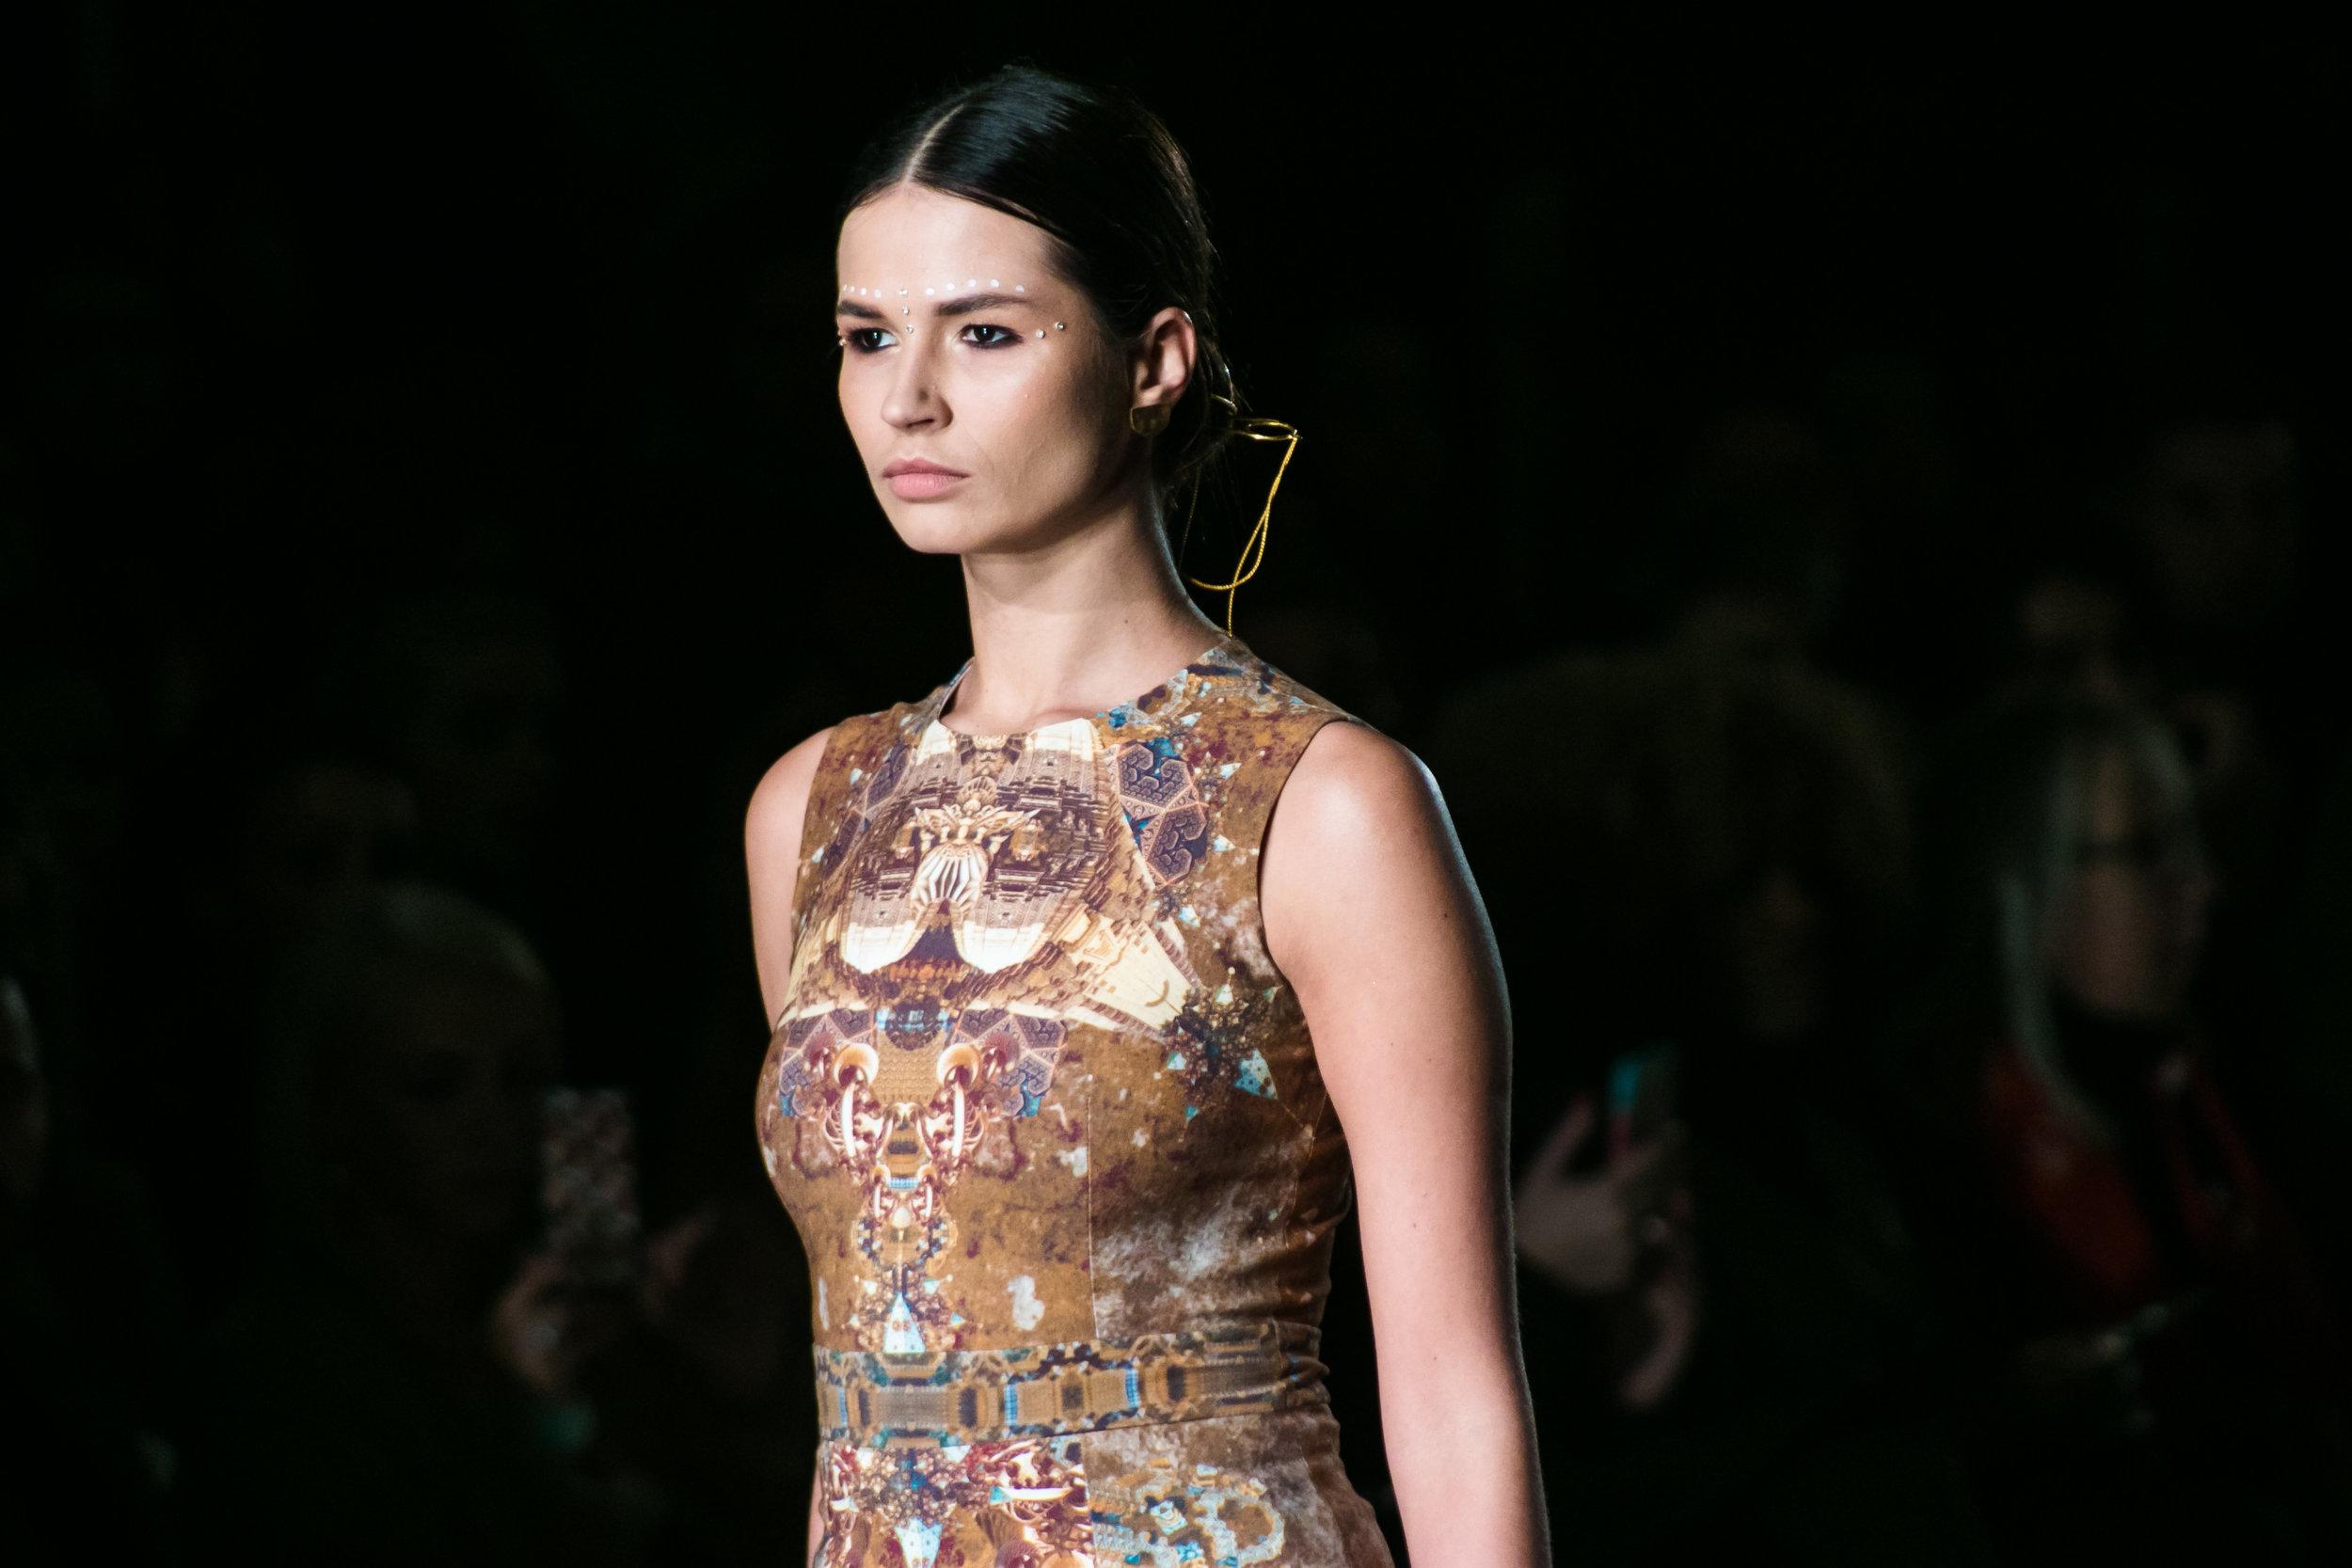 London fashion week Rocky Star AW18 6.jpg